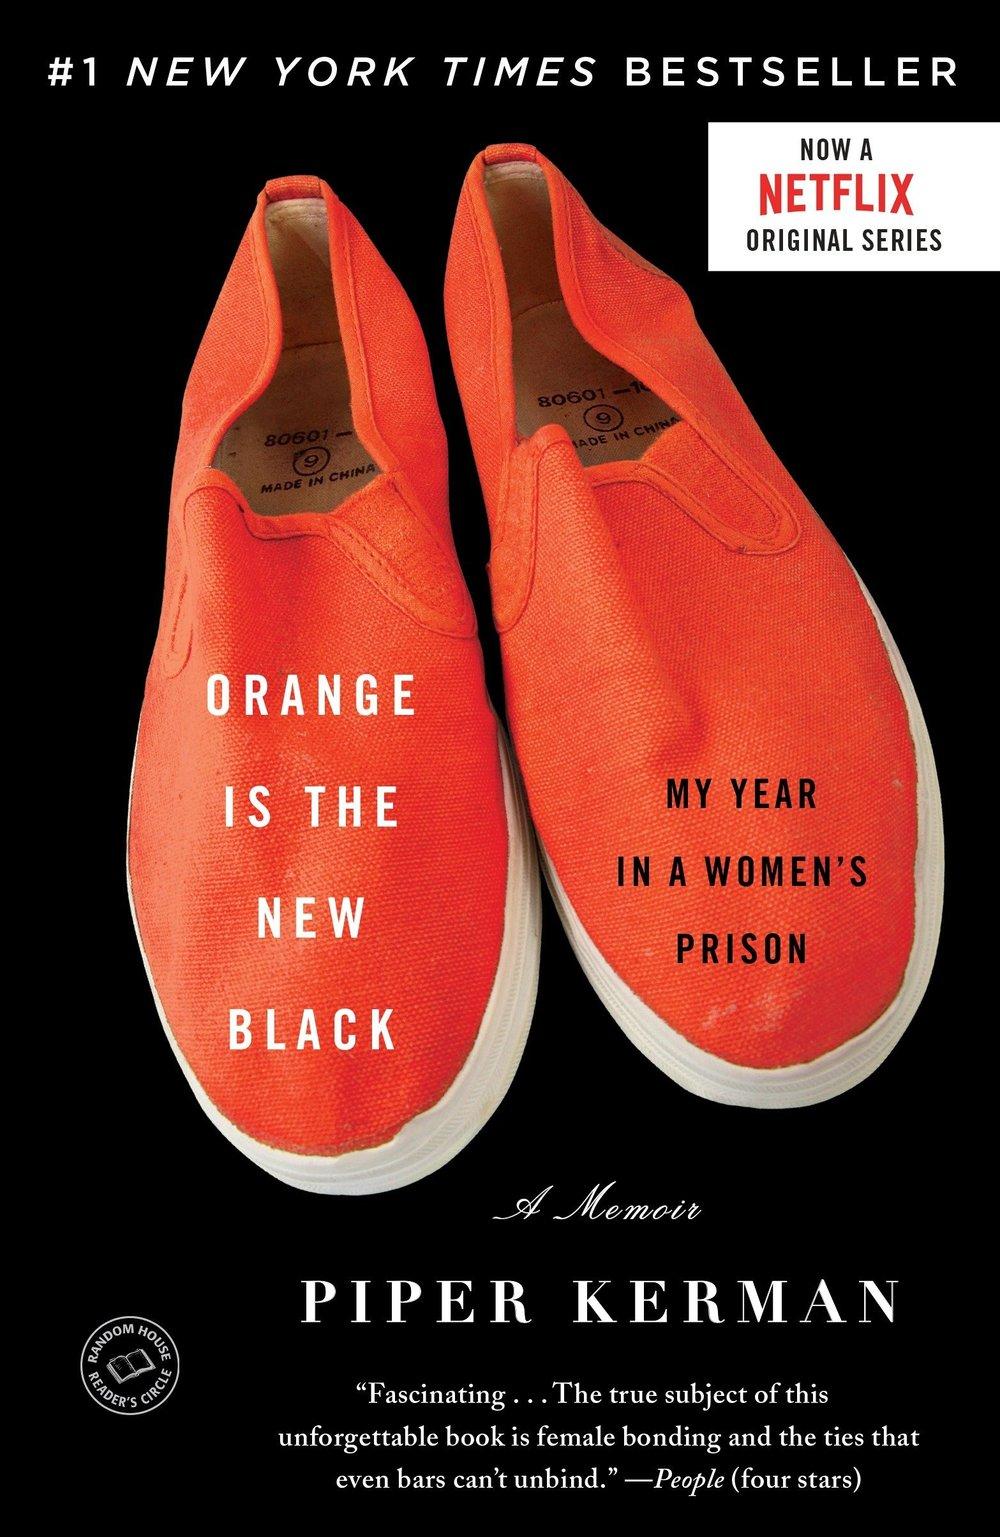 orange-is-the-new-black-book-cover.jpg